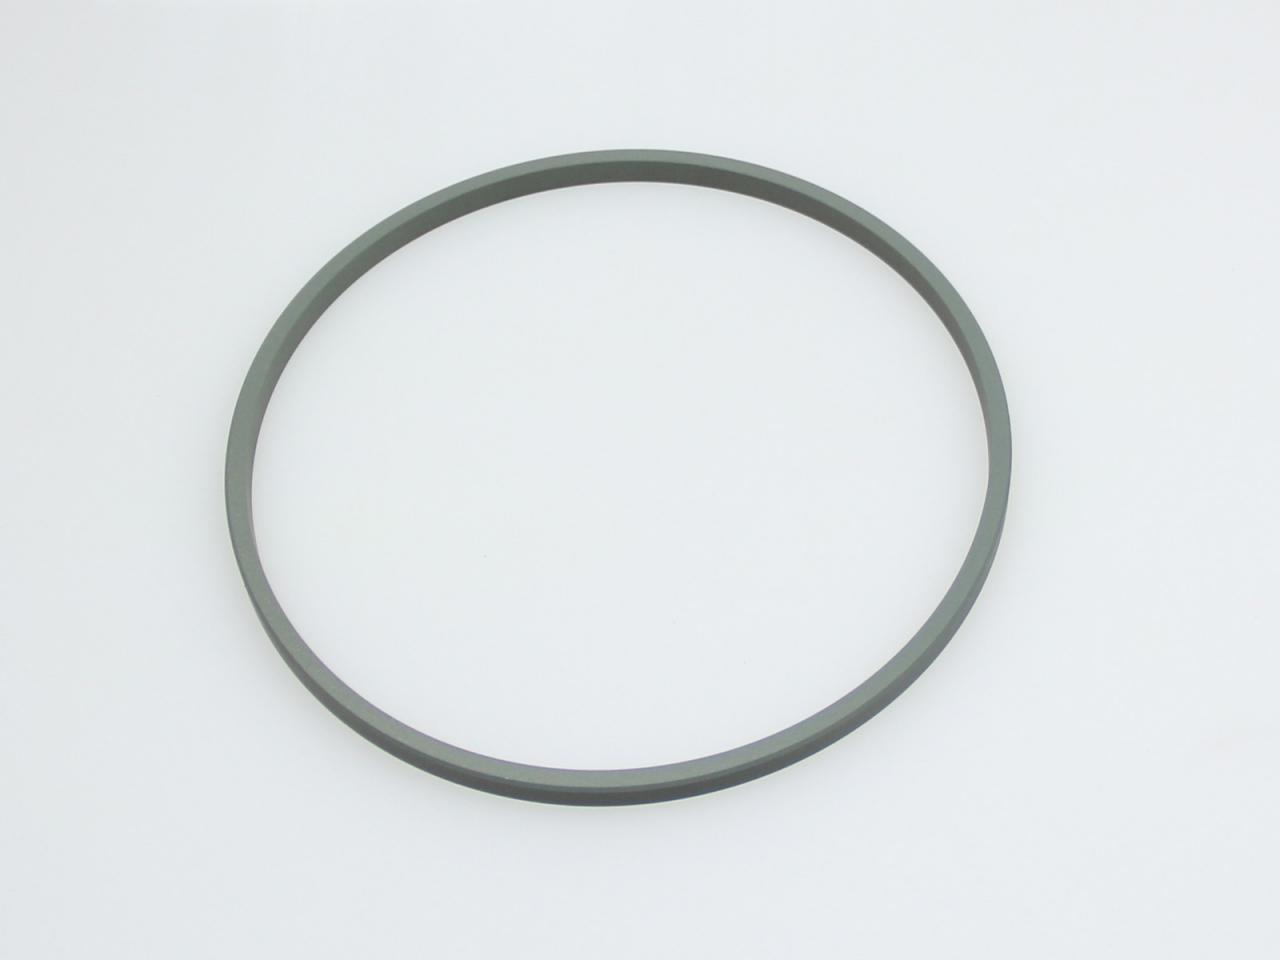 DSH-Piston Seal Design | Piston Seal Bronze Filled PTFE Glyd Ring-1